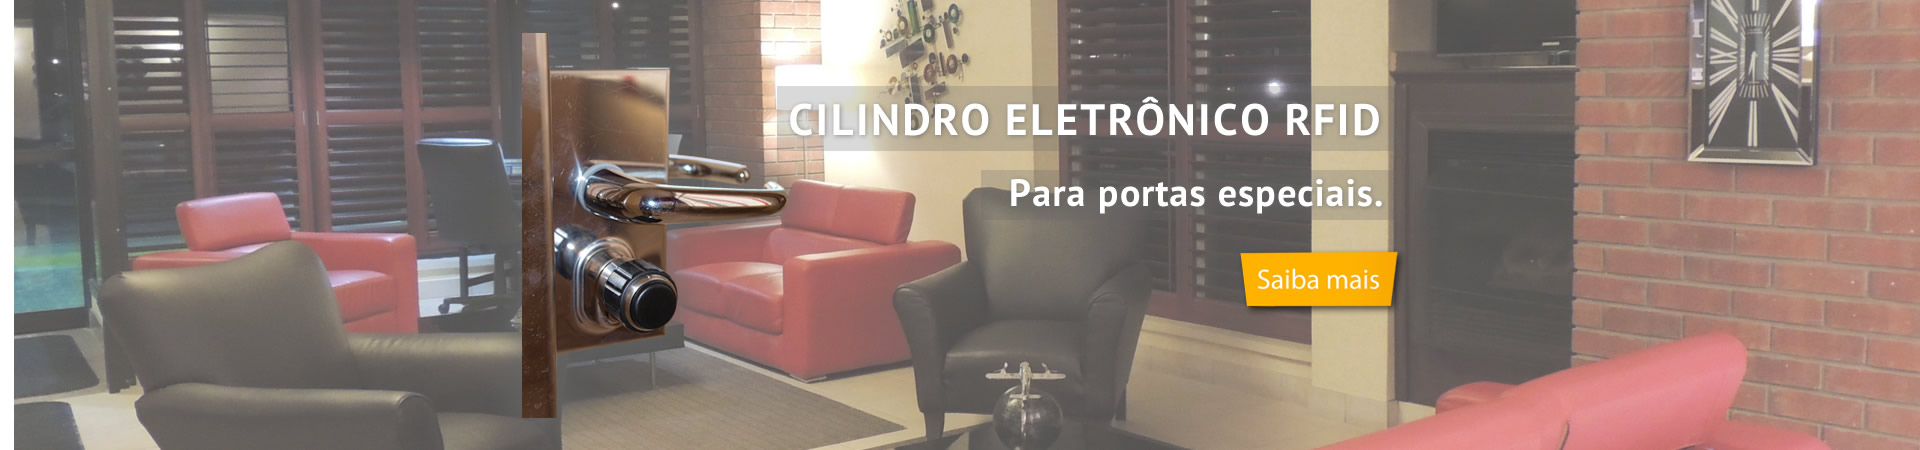 Banner 4 Cilindro Eletrônico Rfit